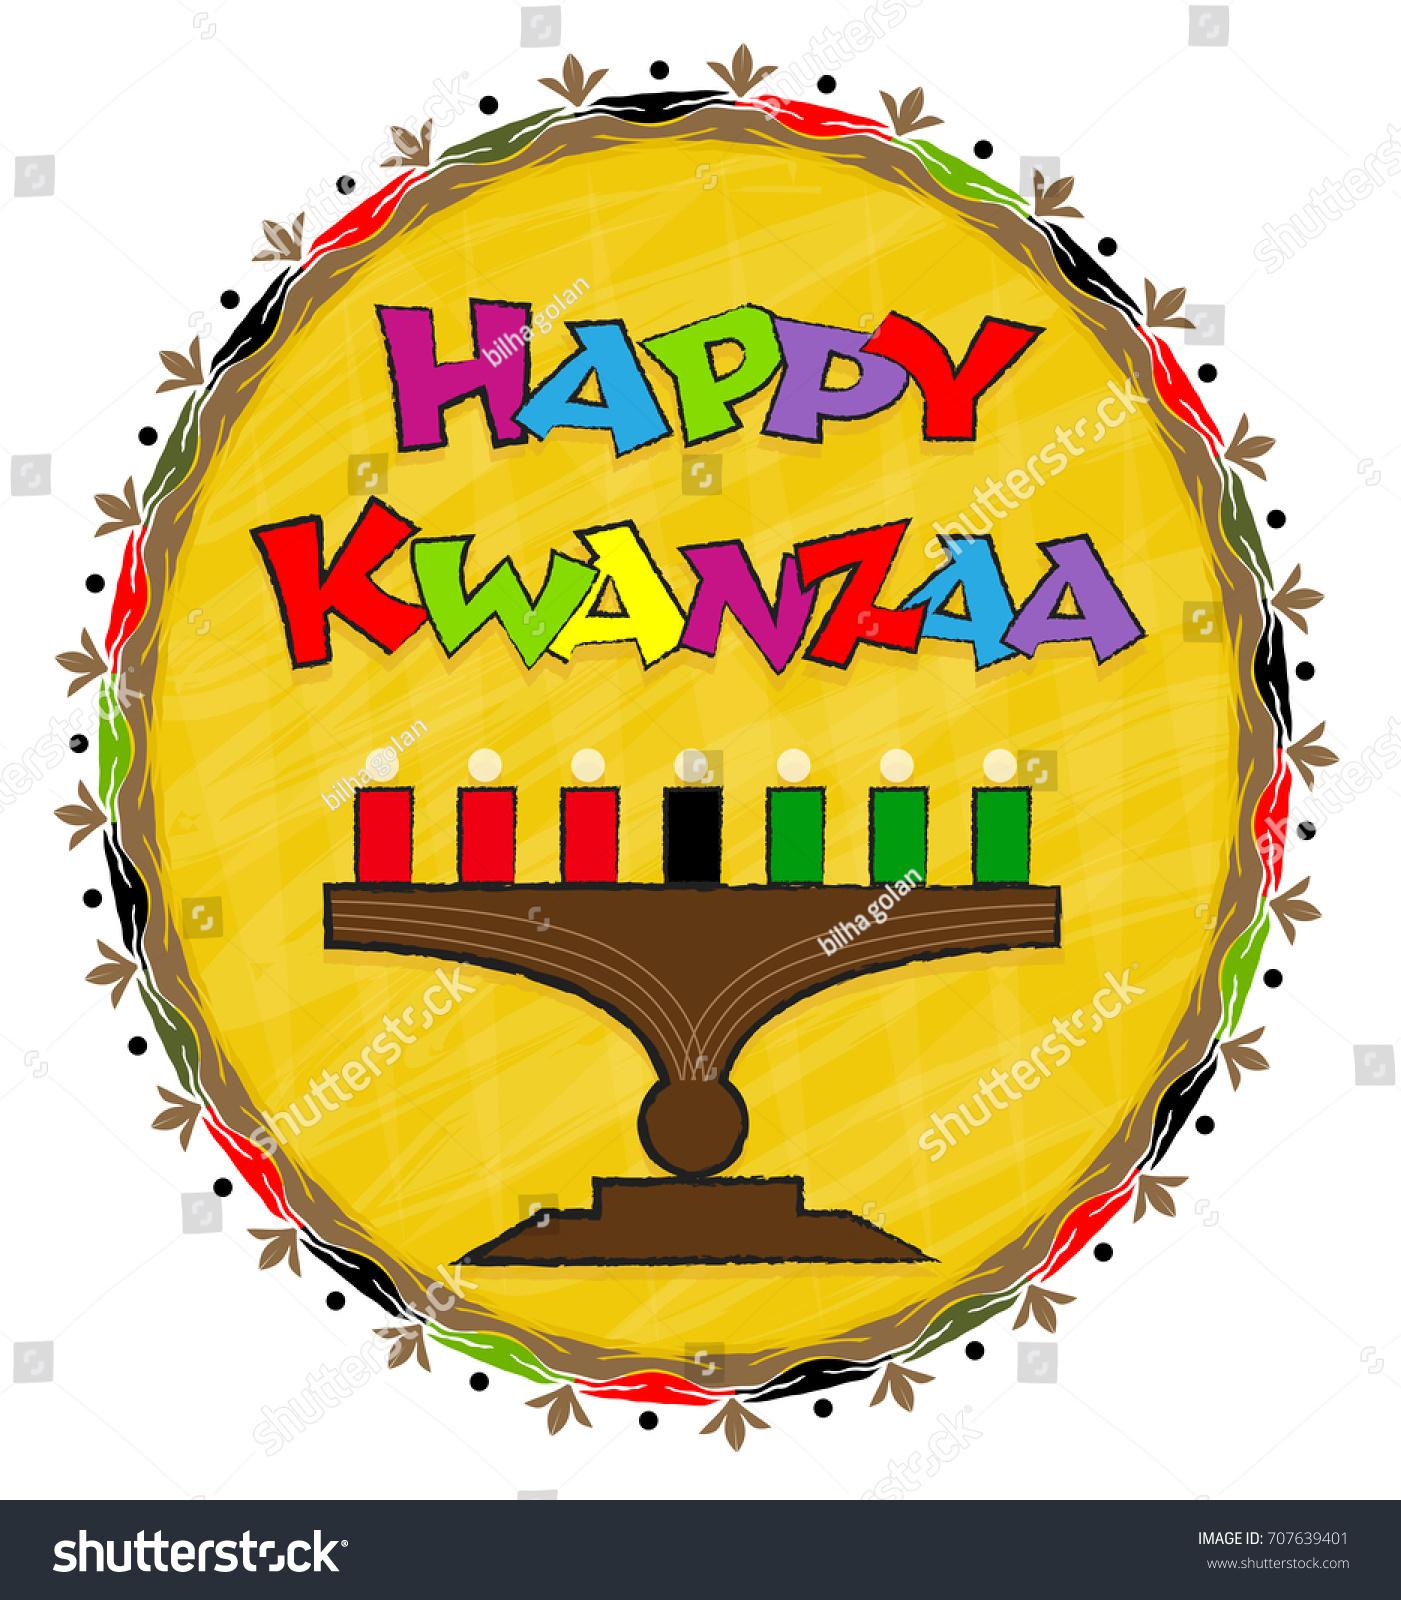 Happy Kwanzaa Clip Art Festive Clipart Stock Vector ...